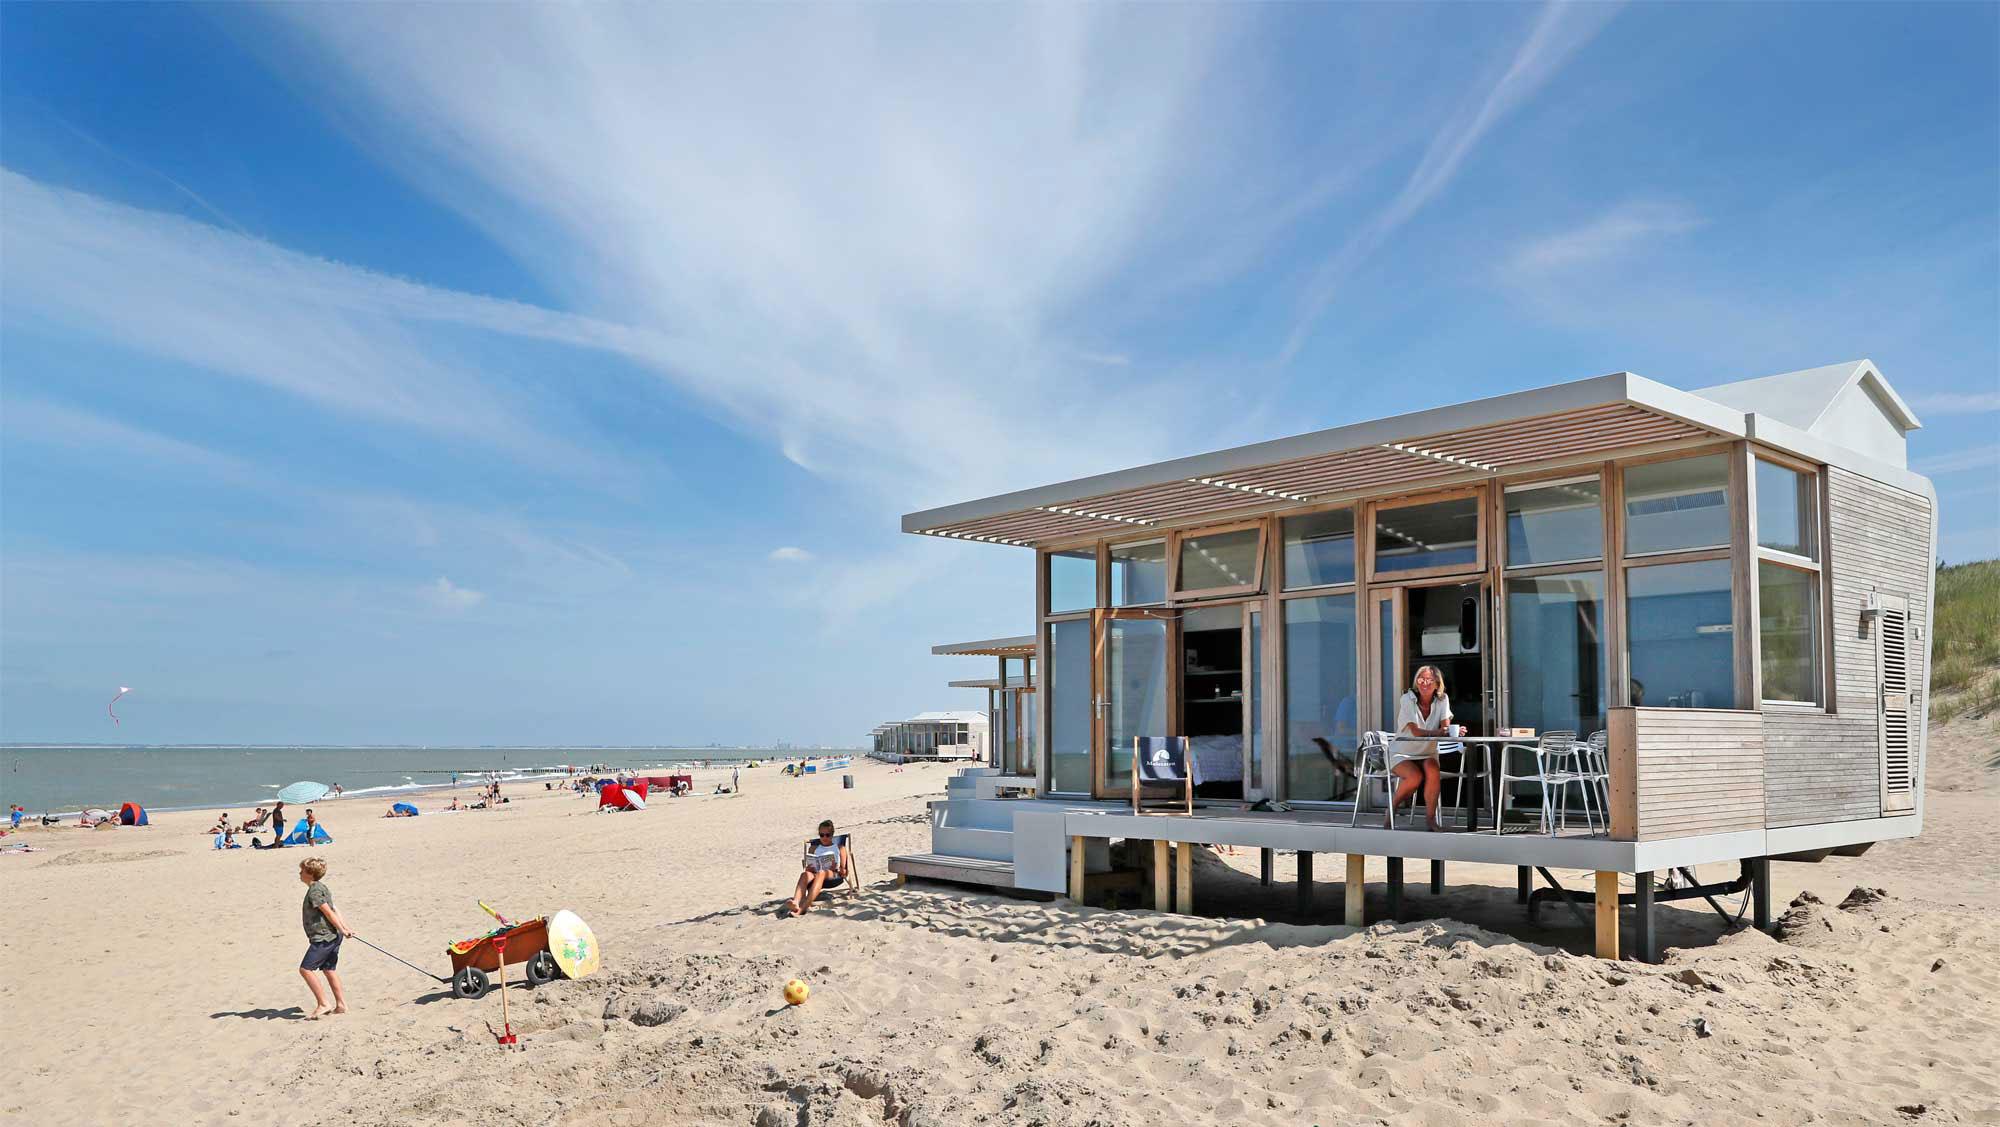 6pers strandhuisje Molecaten Park Hoogduin 01